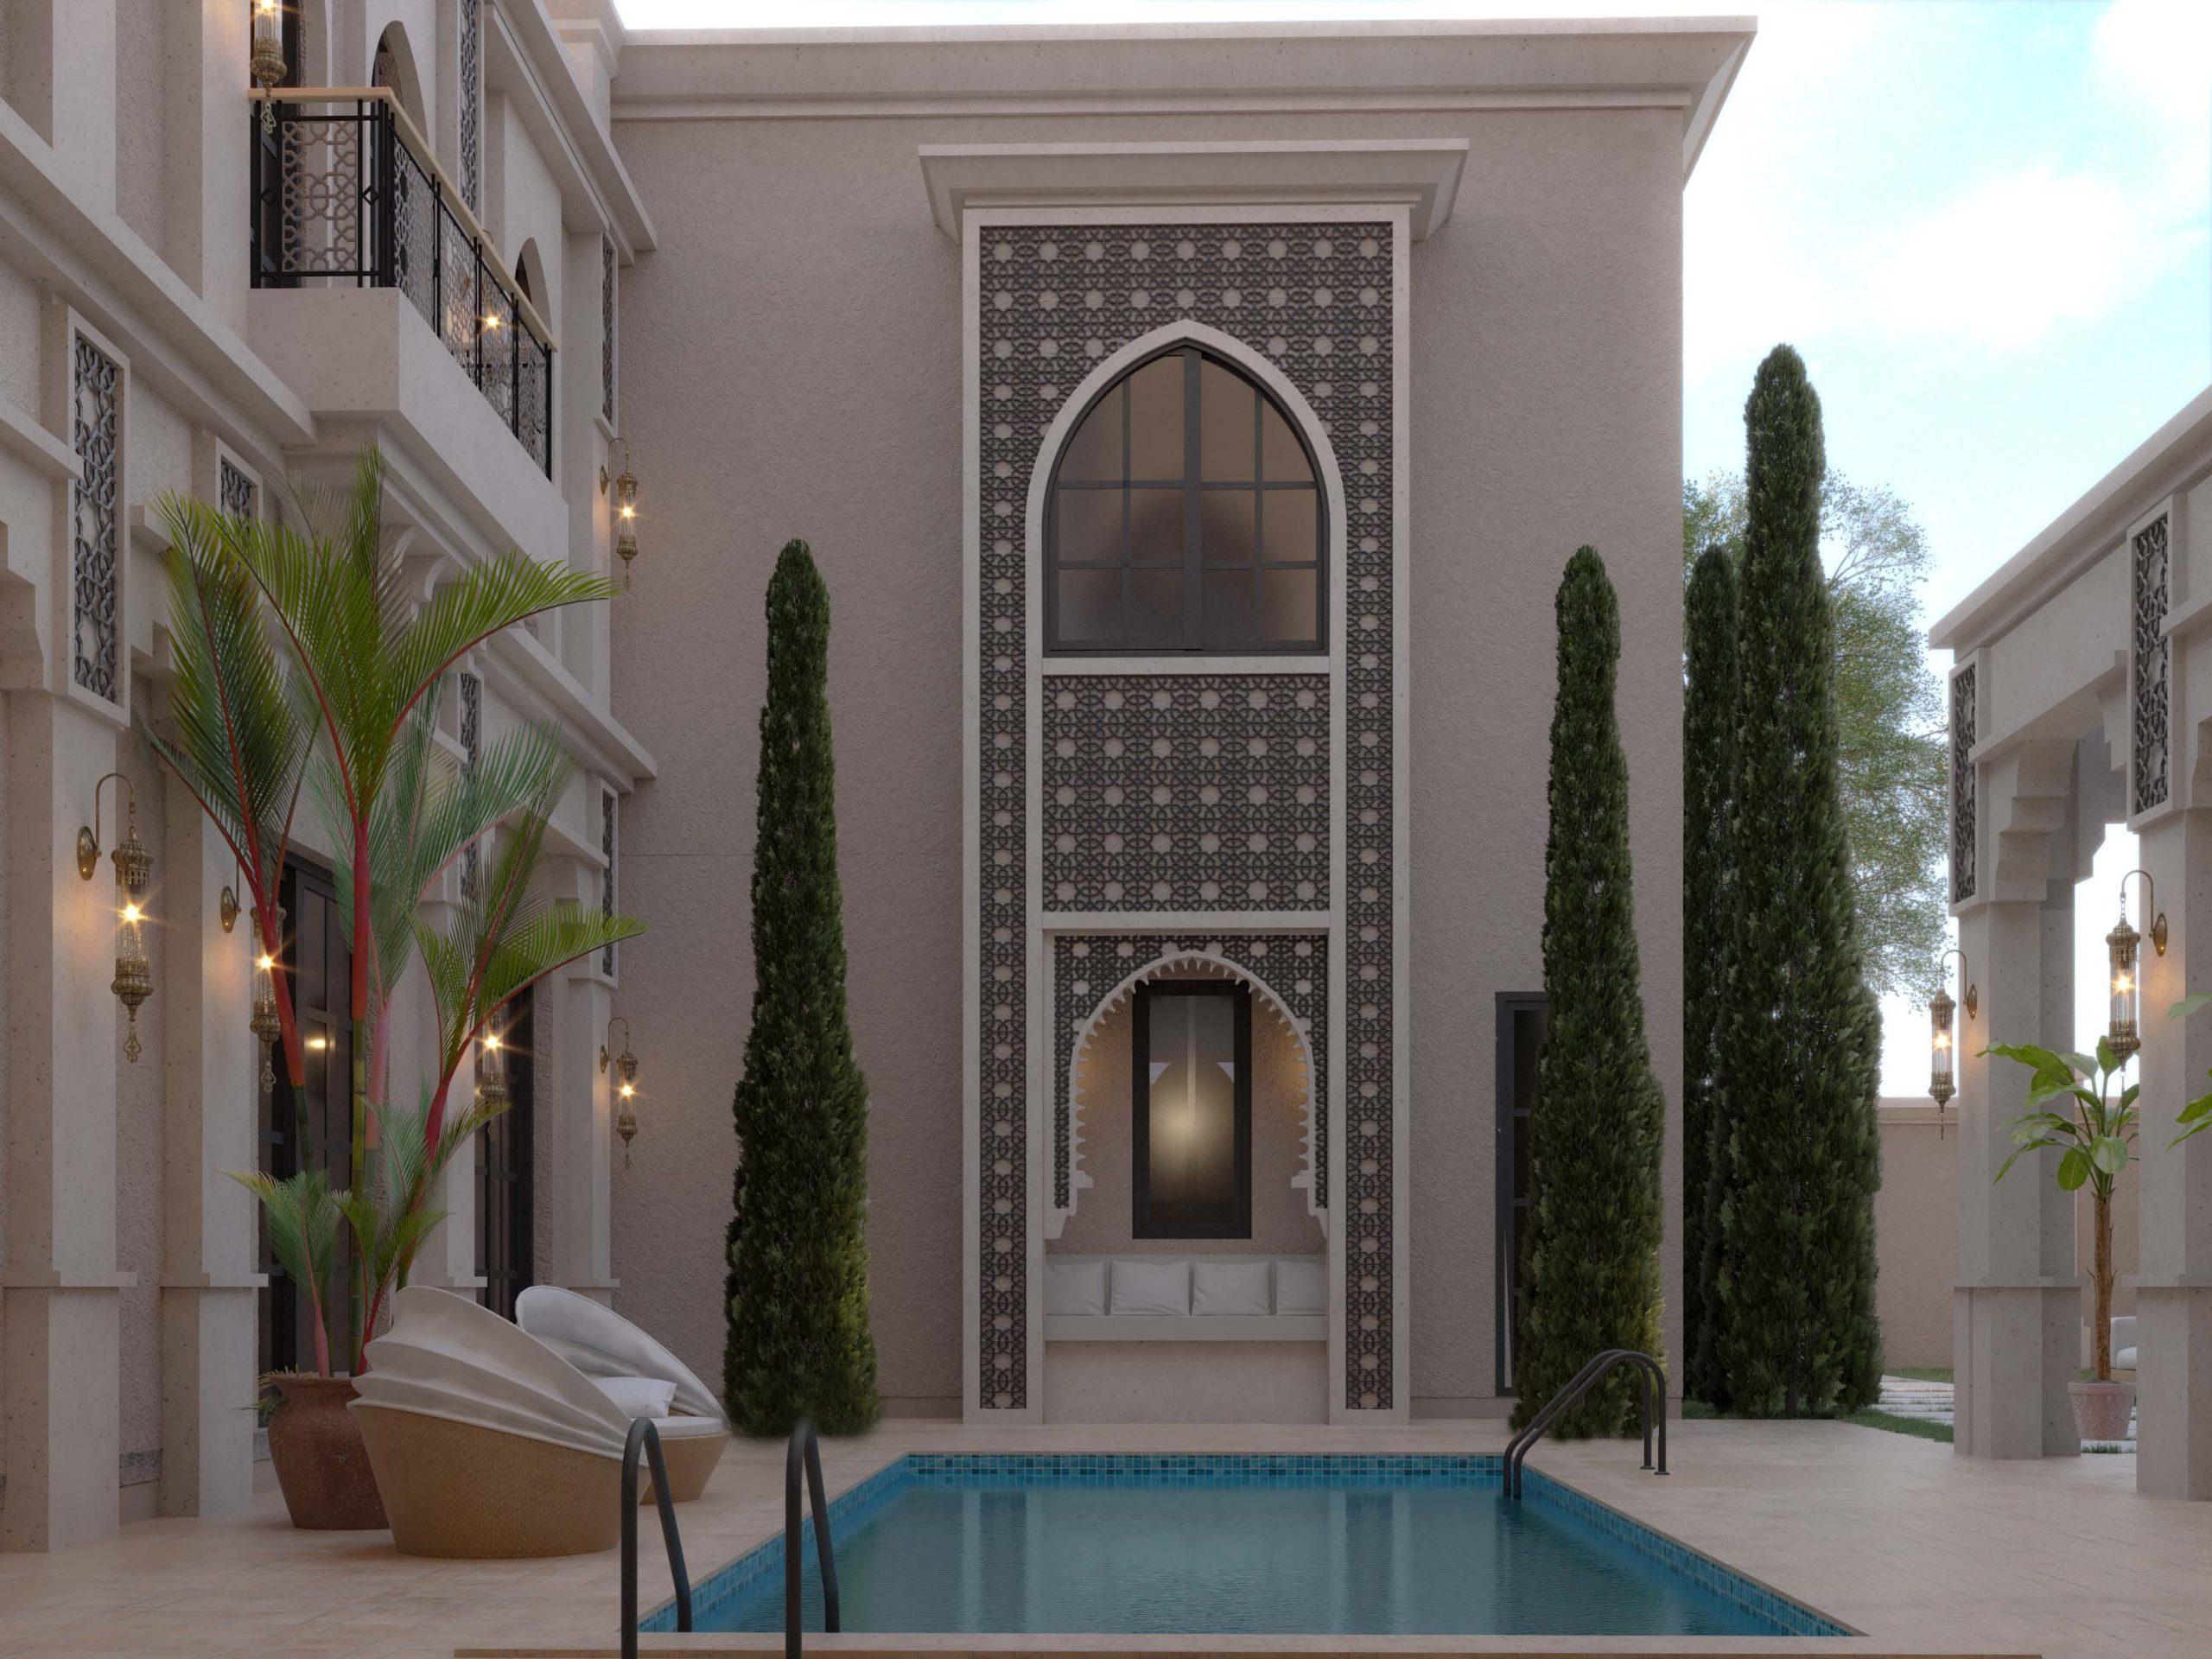 ISLAMIC STYLE VILLA - decoration - design - swimming pool - trees - great